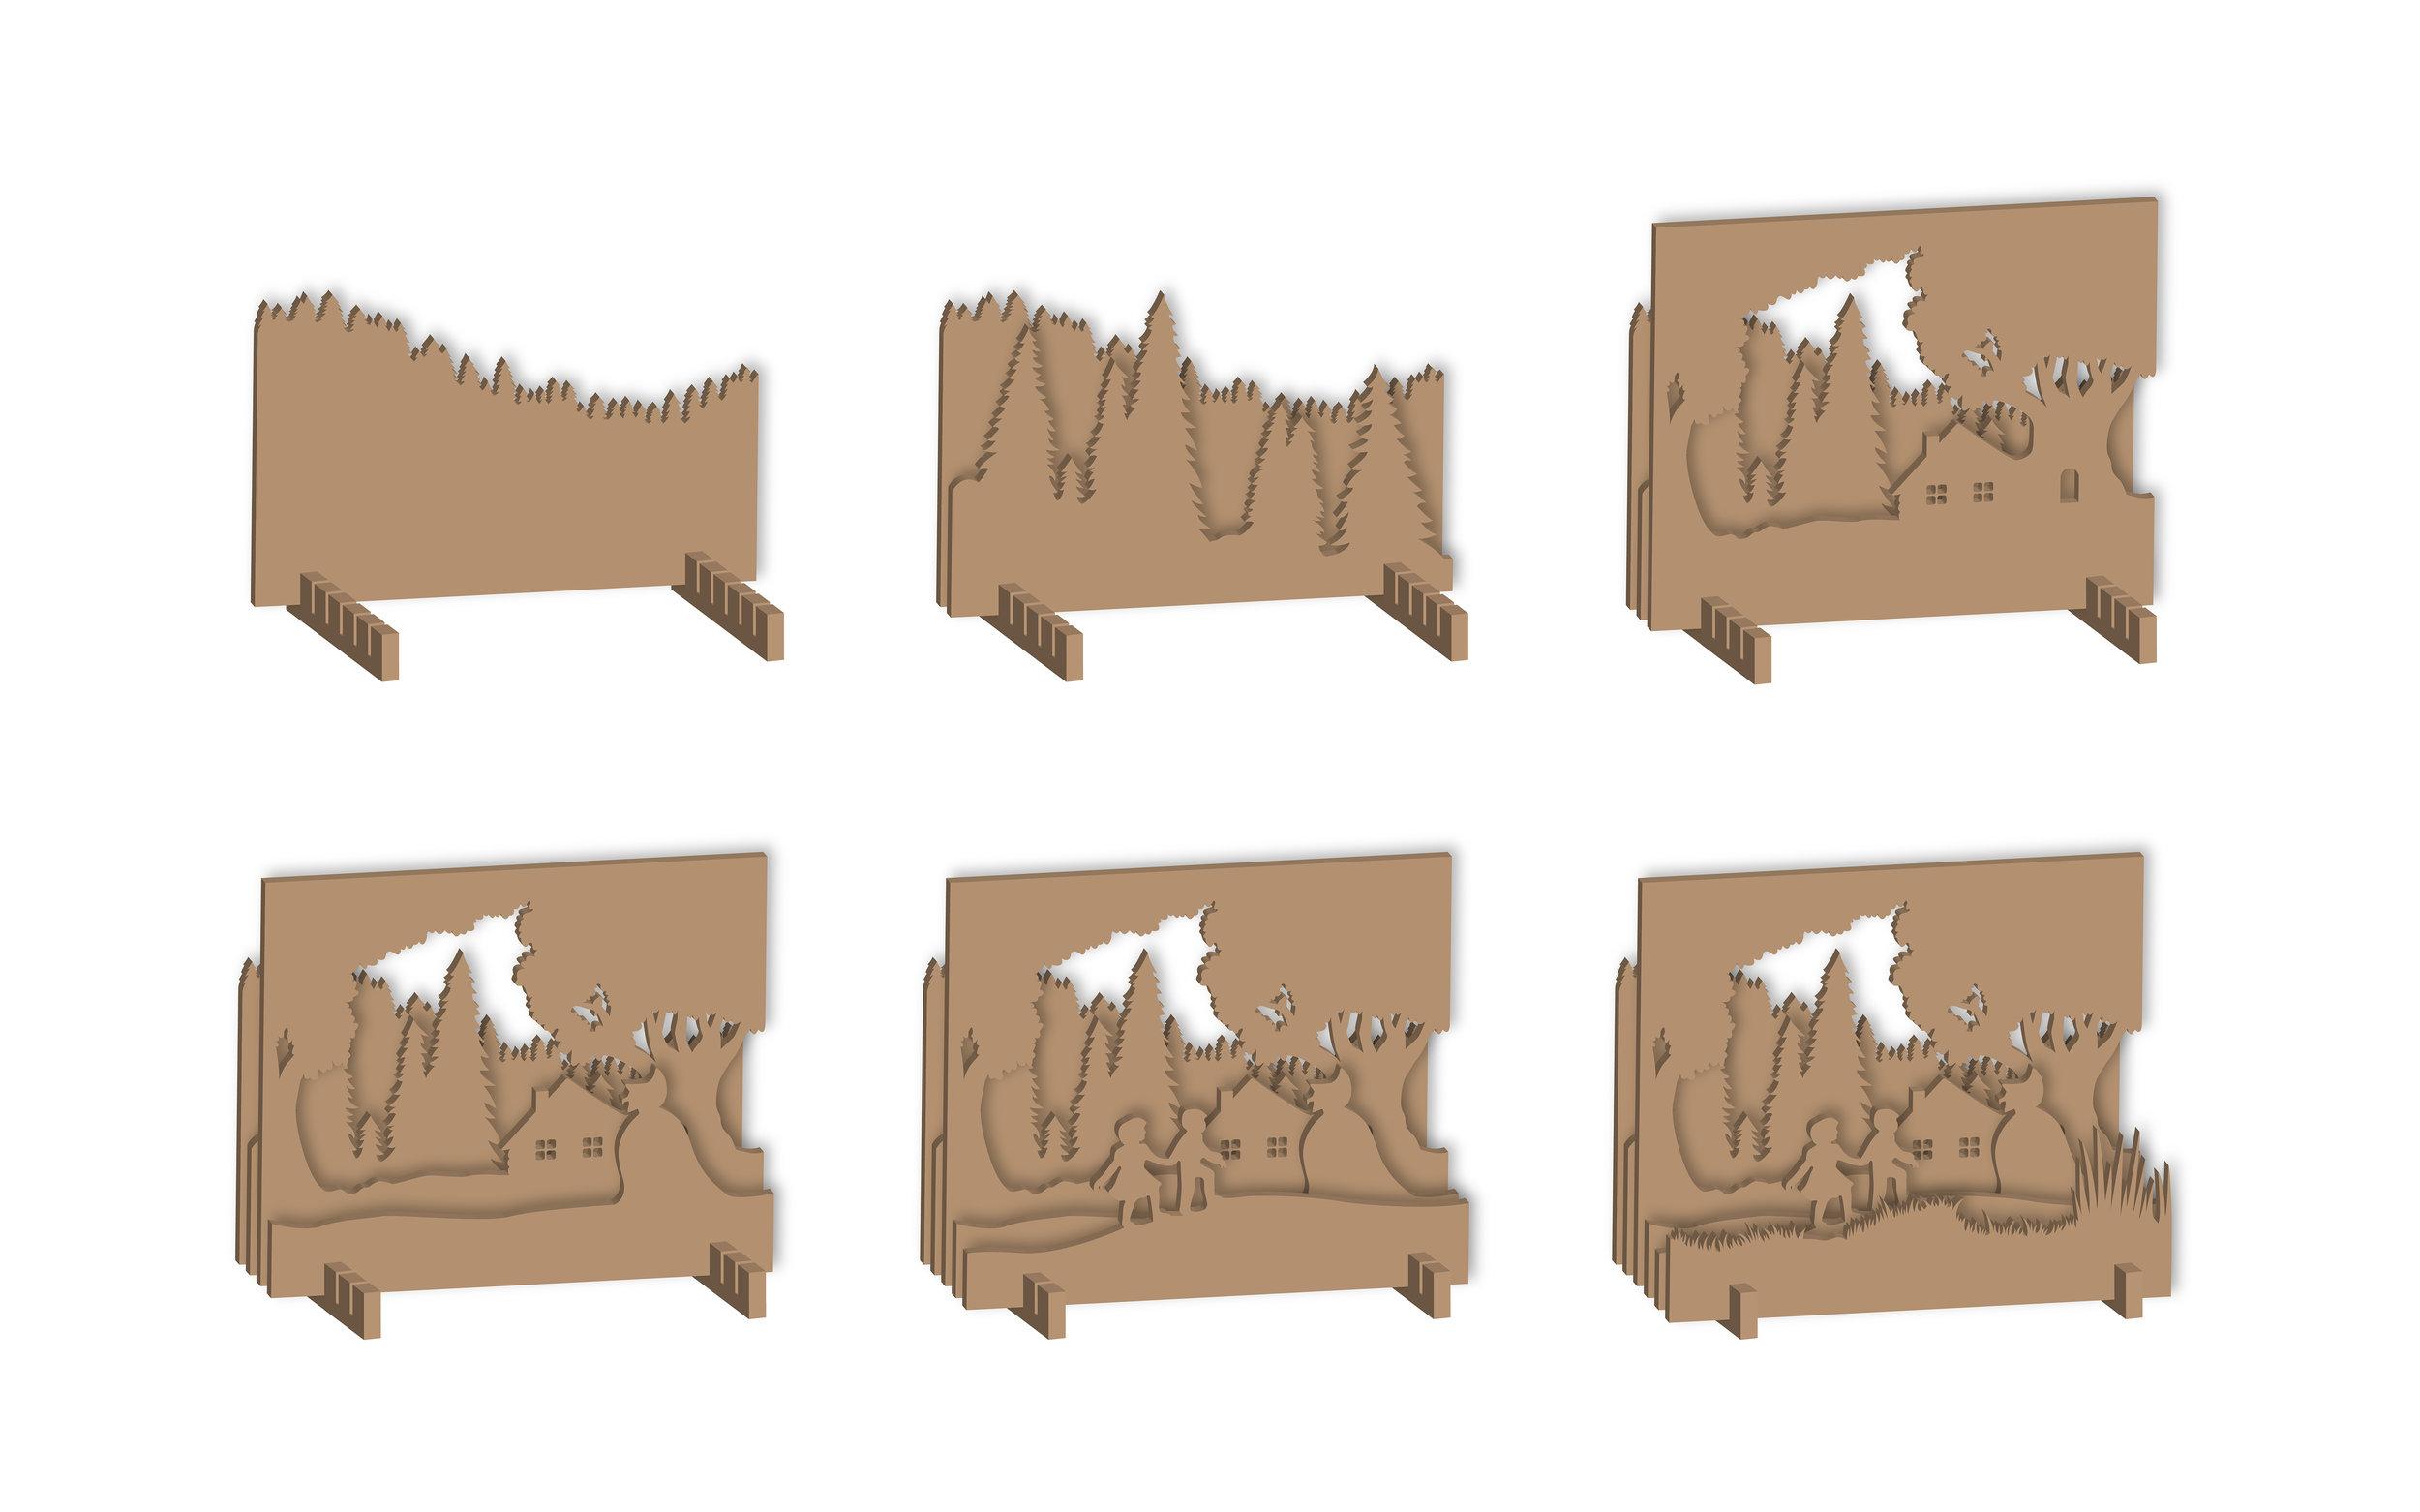 3Dscenes.jpg